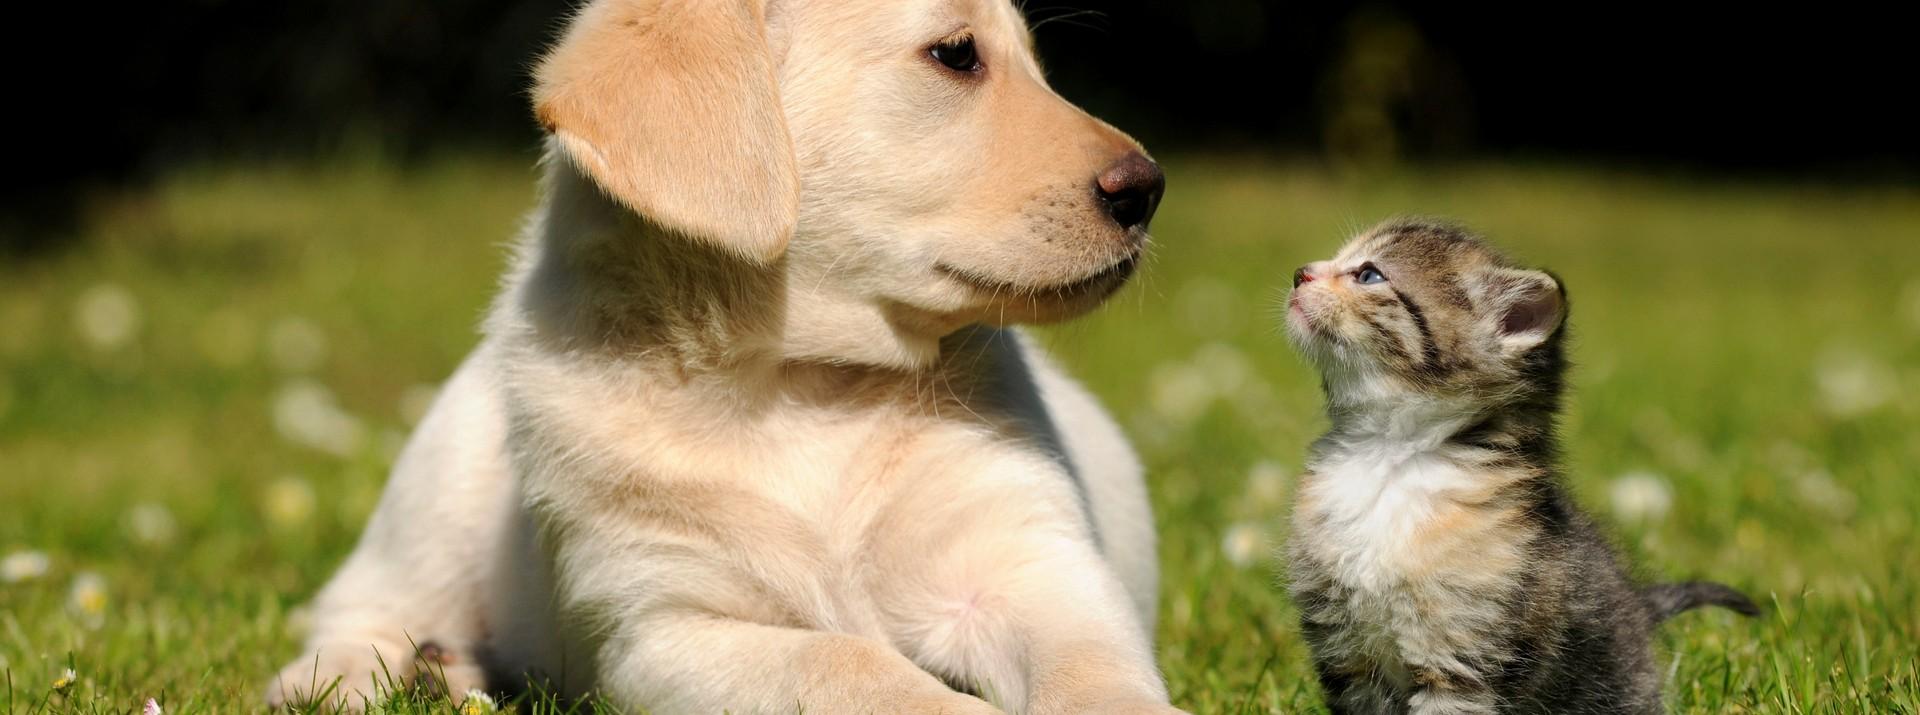 Prendre soin de son animal au naturel